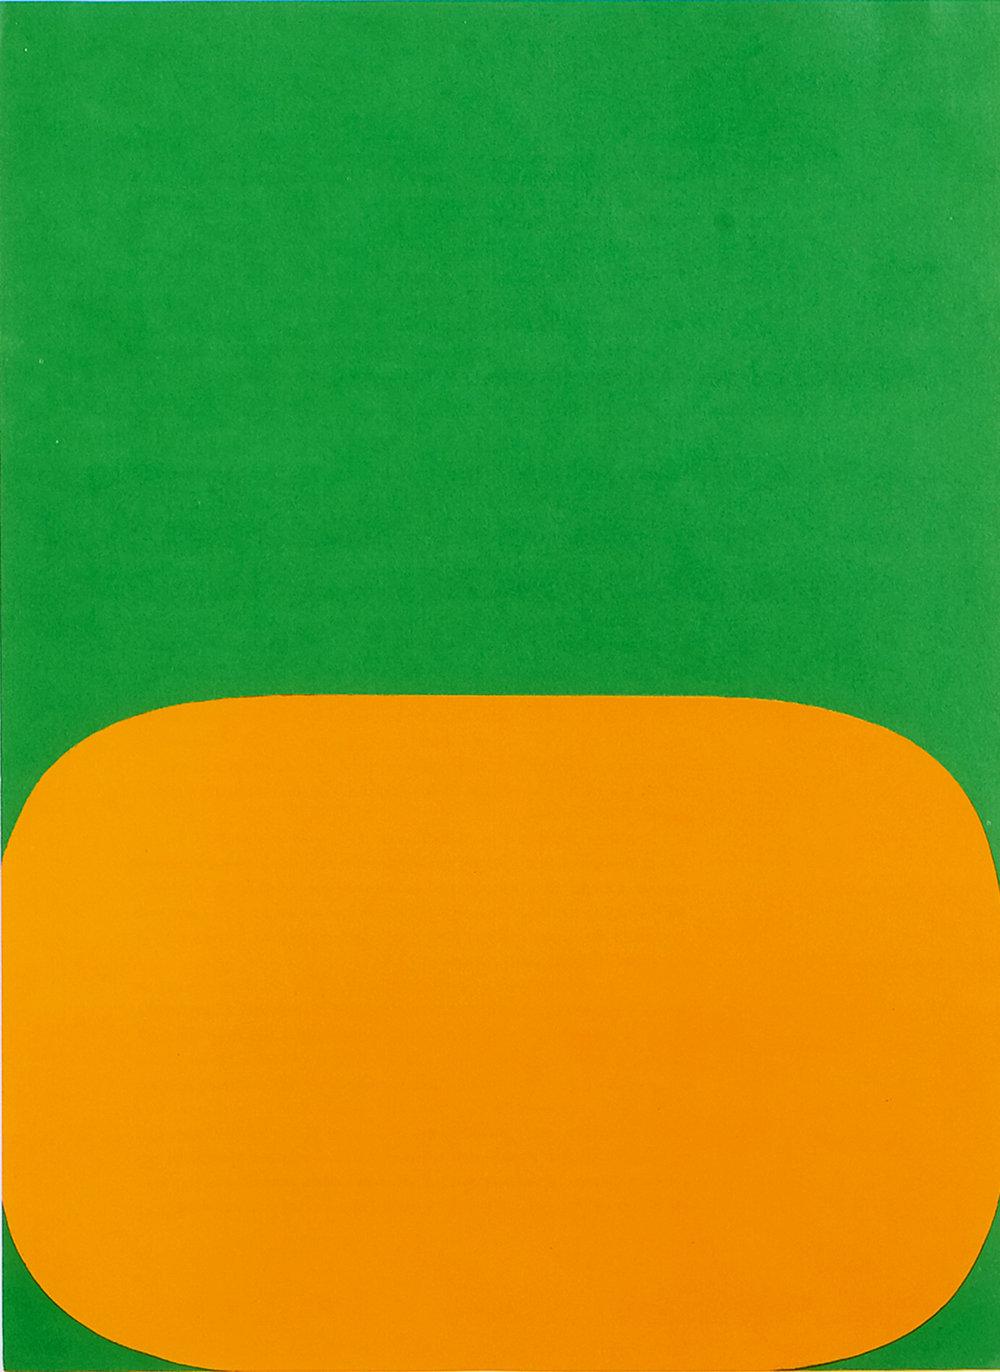 Ellsworth Kelly Orange and the Green.jpg